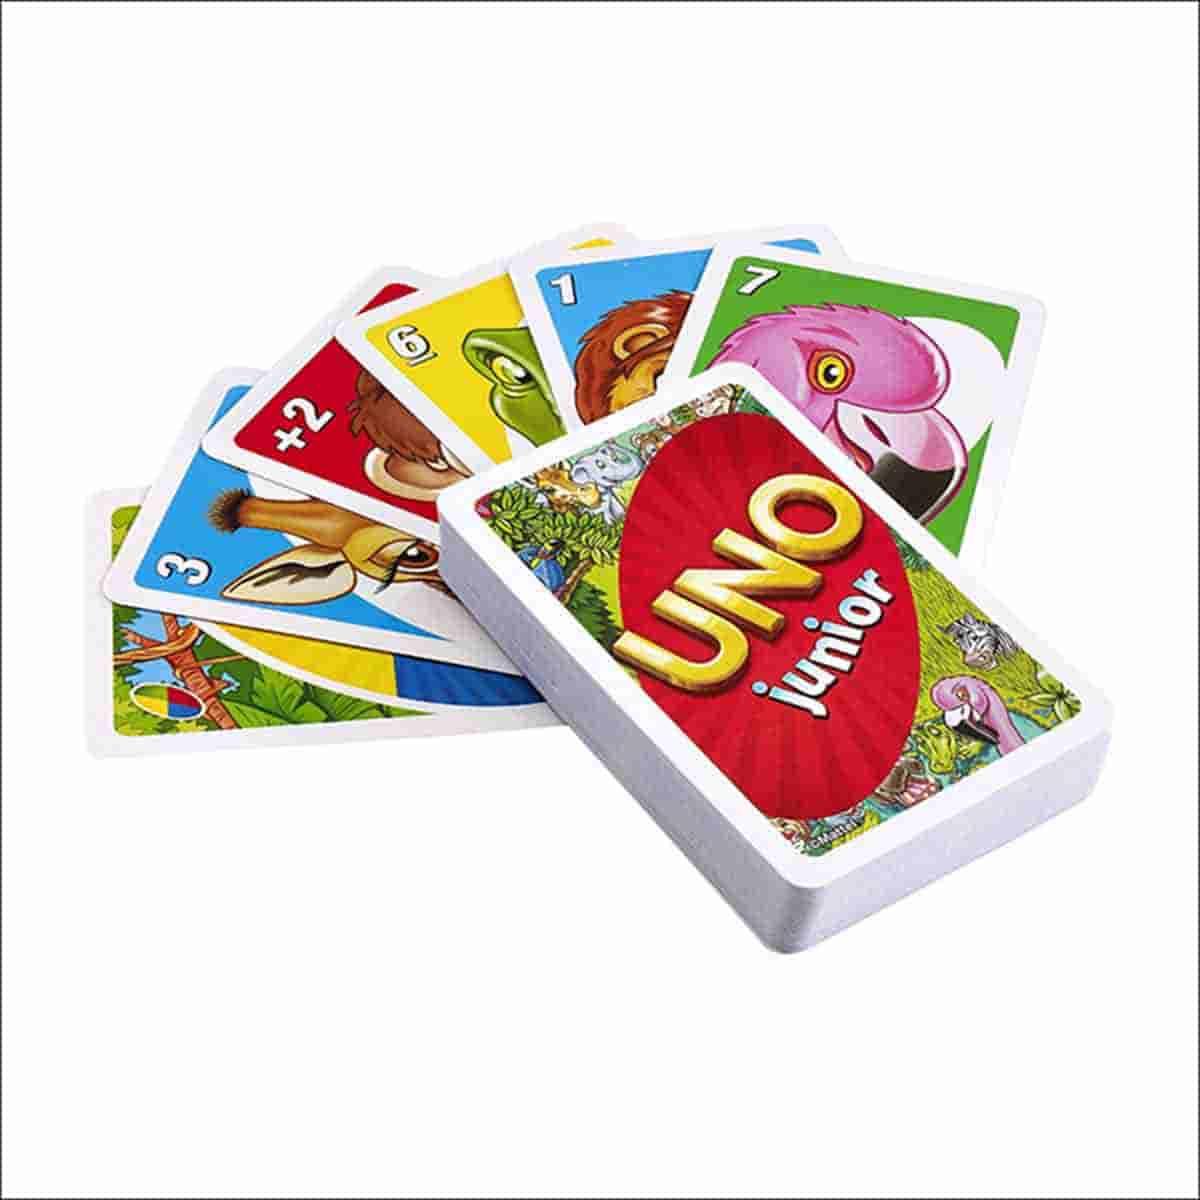 juegos de mesa para peques